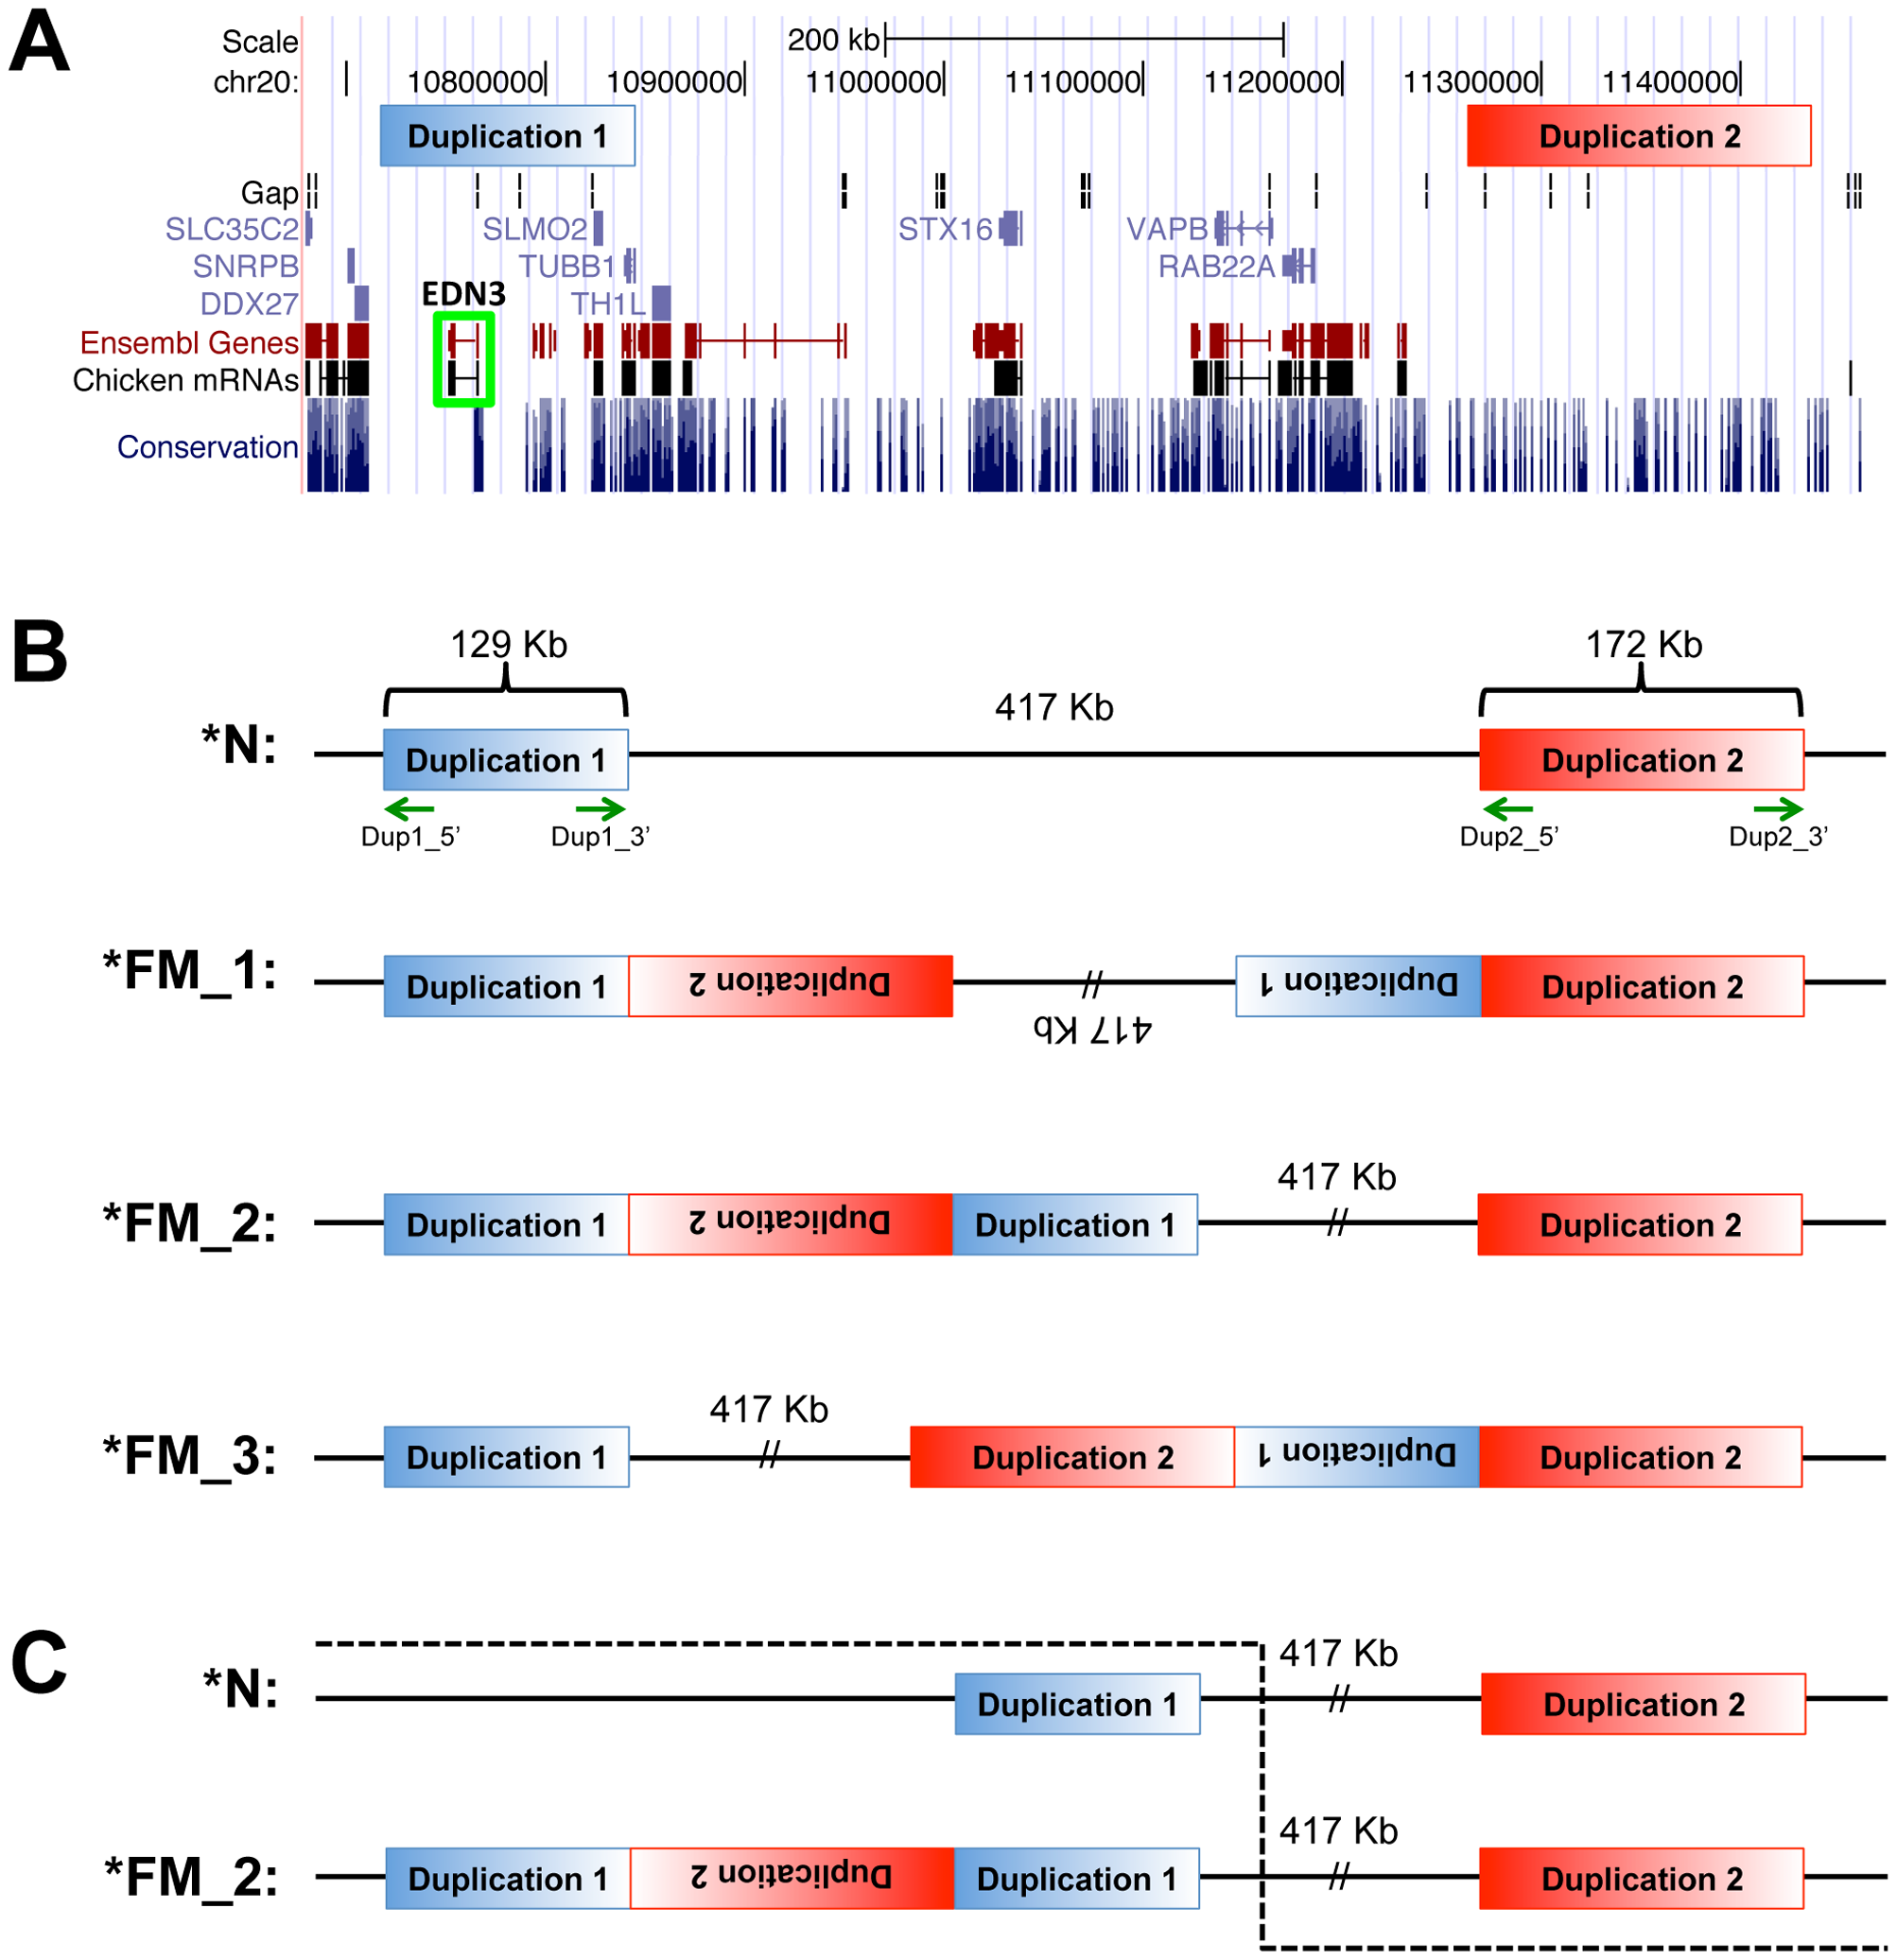 Genome view of duplicated regions and possible rearrangement scenarios.